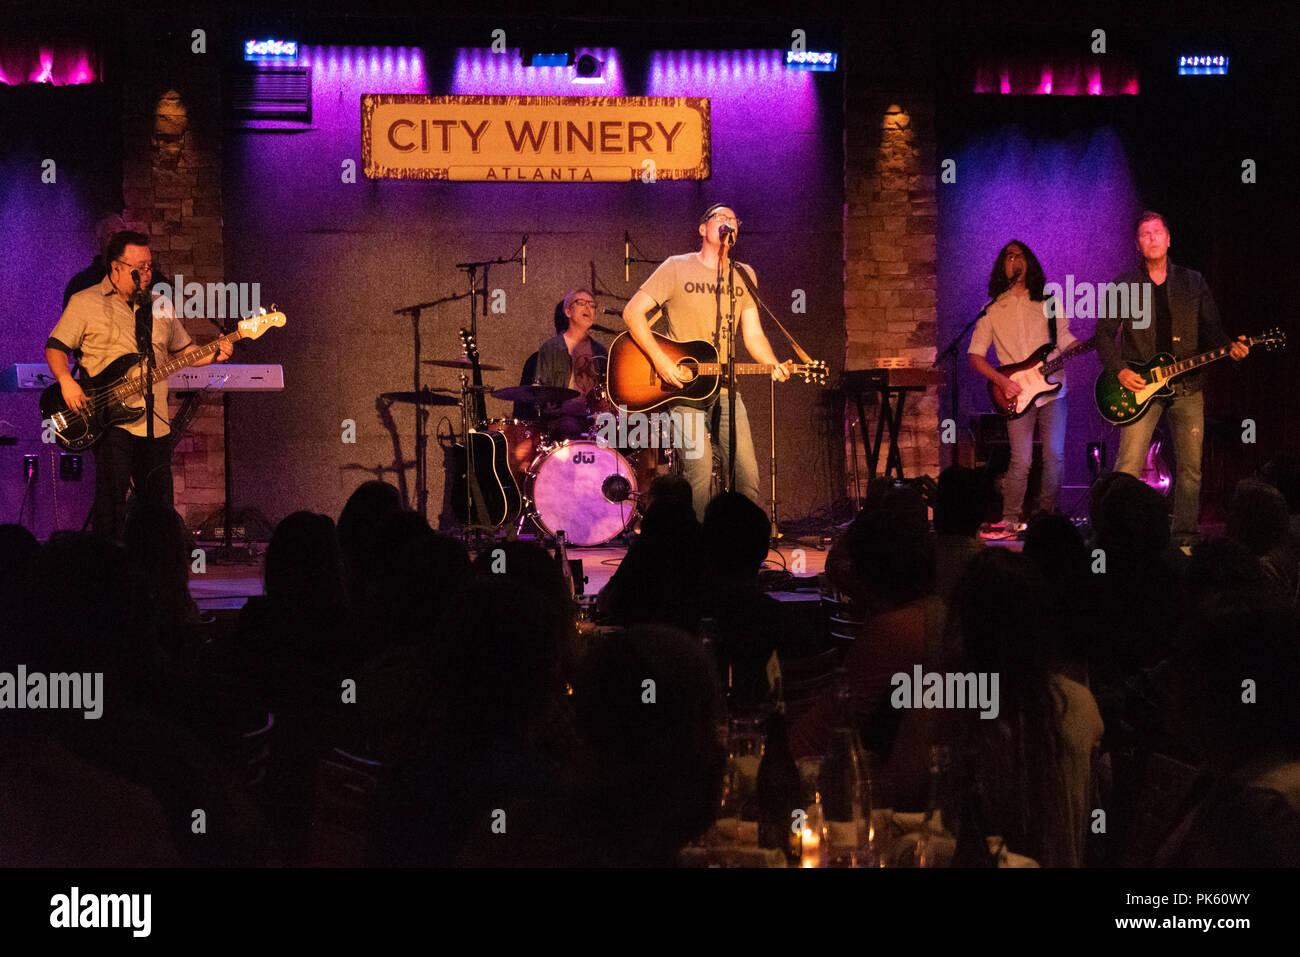 Smalltown Poets performing live at City Winery in Atlanta, GA. (USA) - Stock Image